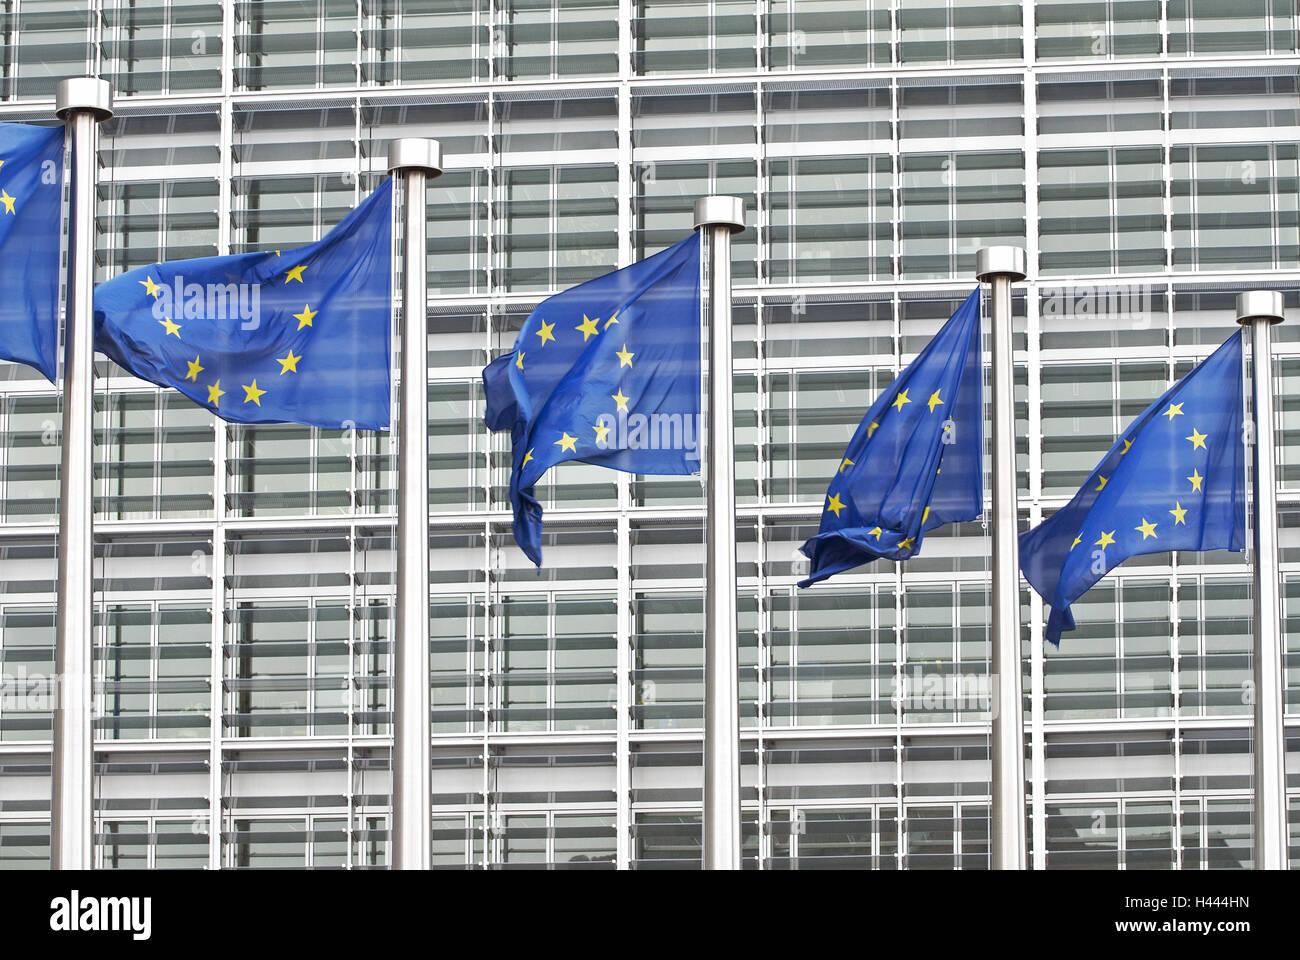 European flags, blowing, Berlaymont building, Belgium, Brussels, - Stock Image